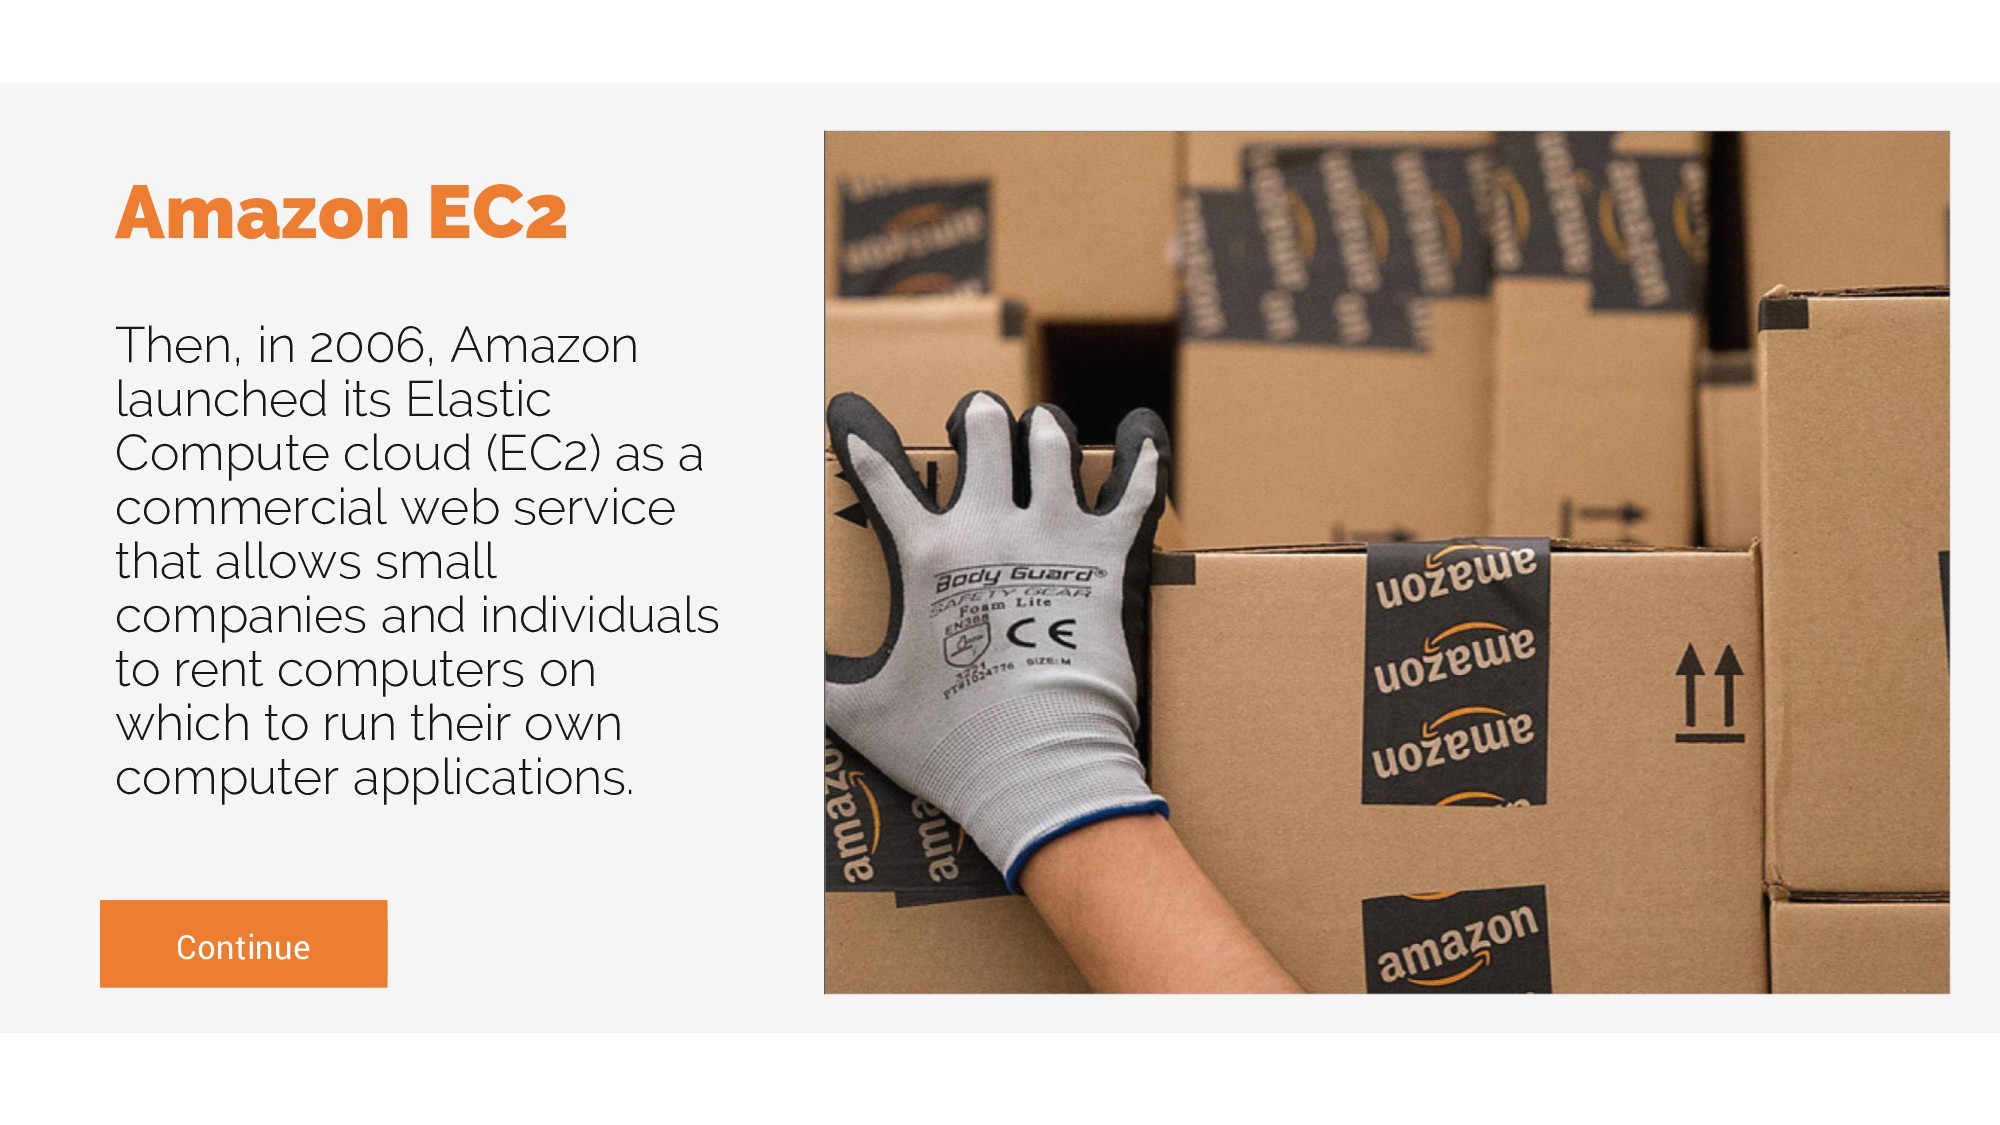 Continue Amazon EC2 Then, in 2006, Amazon launc...